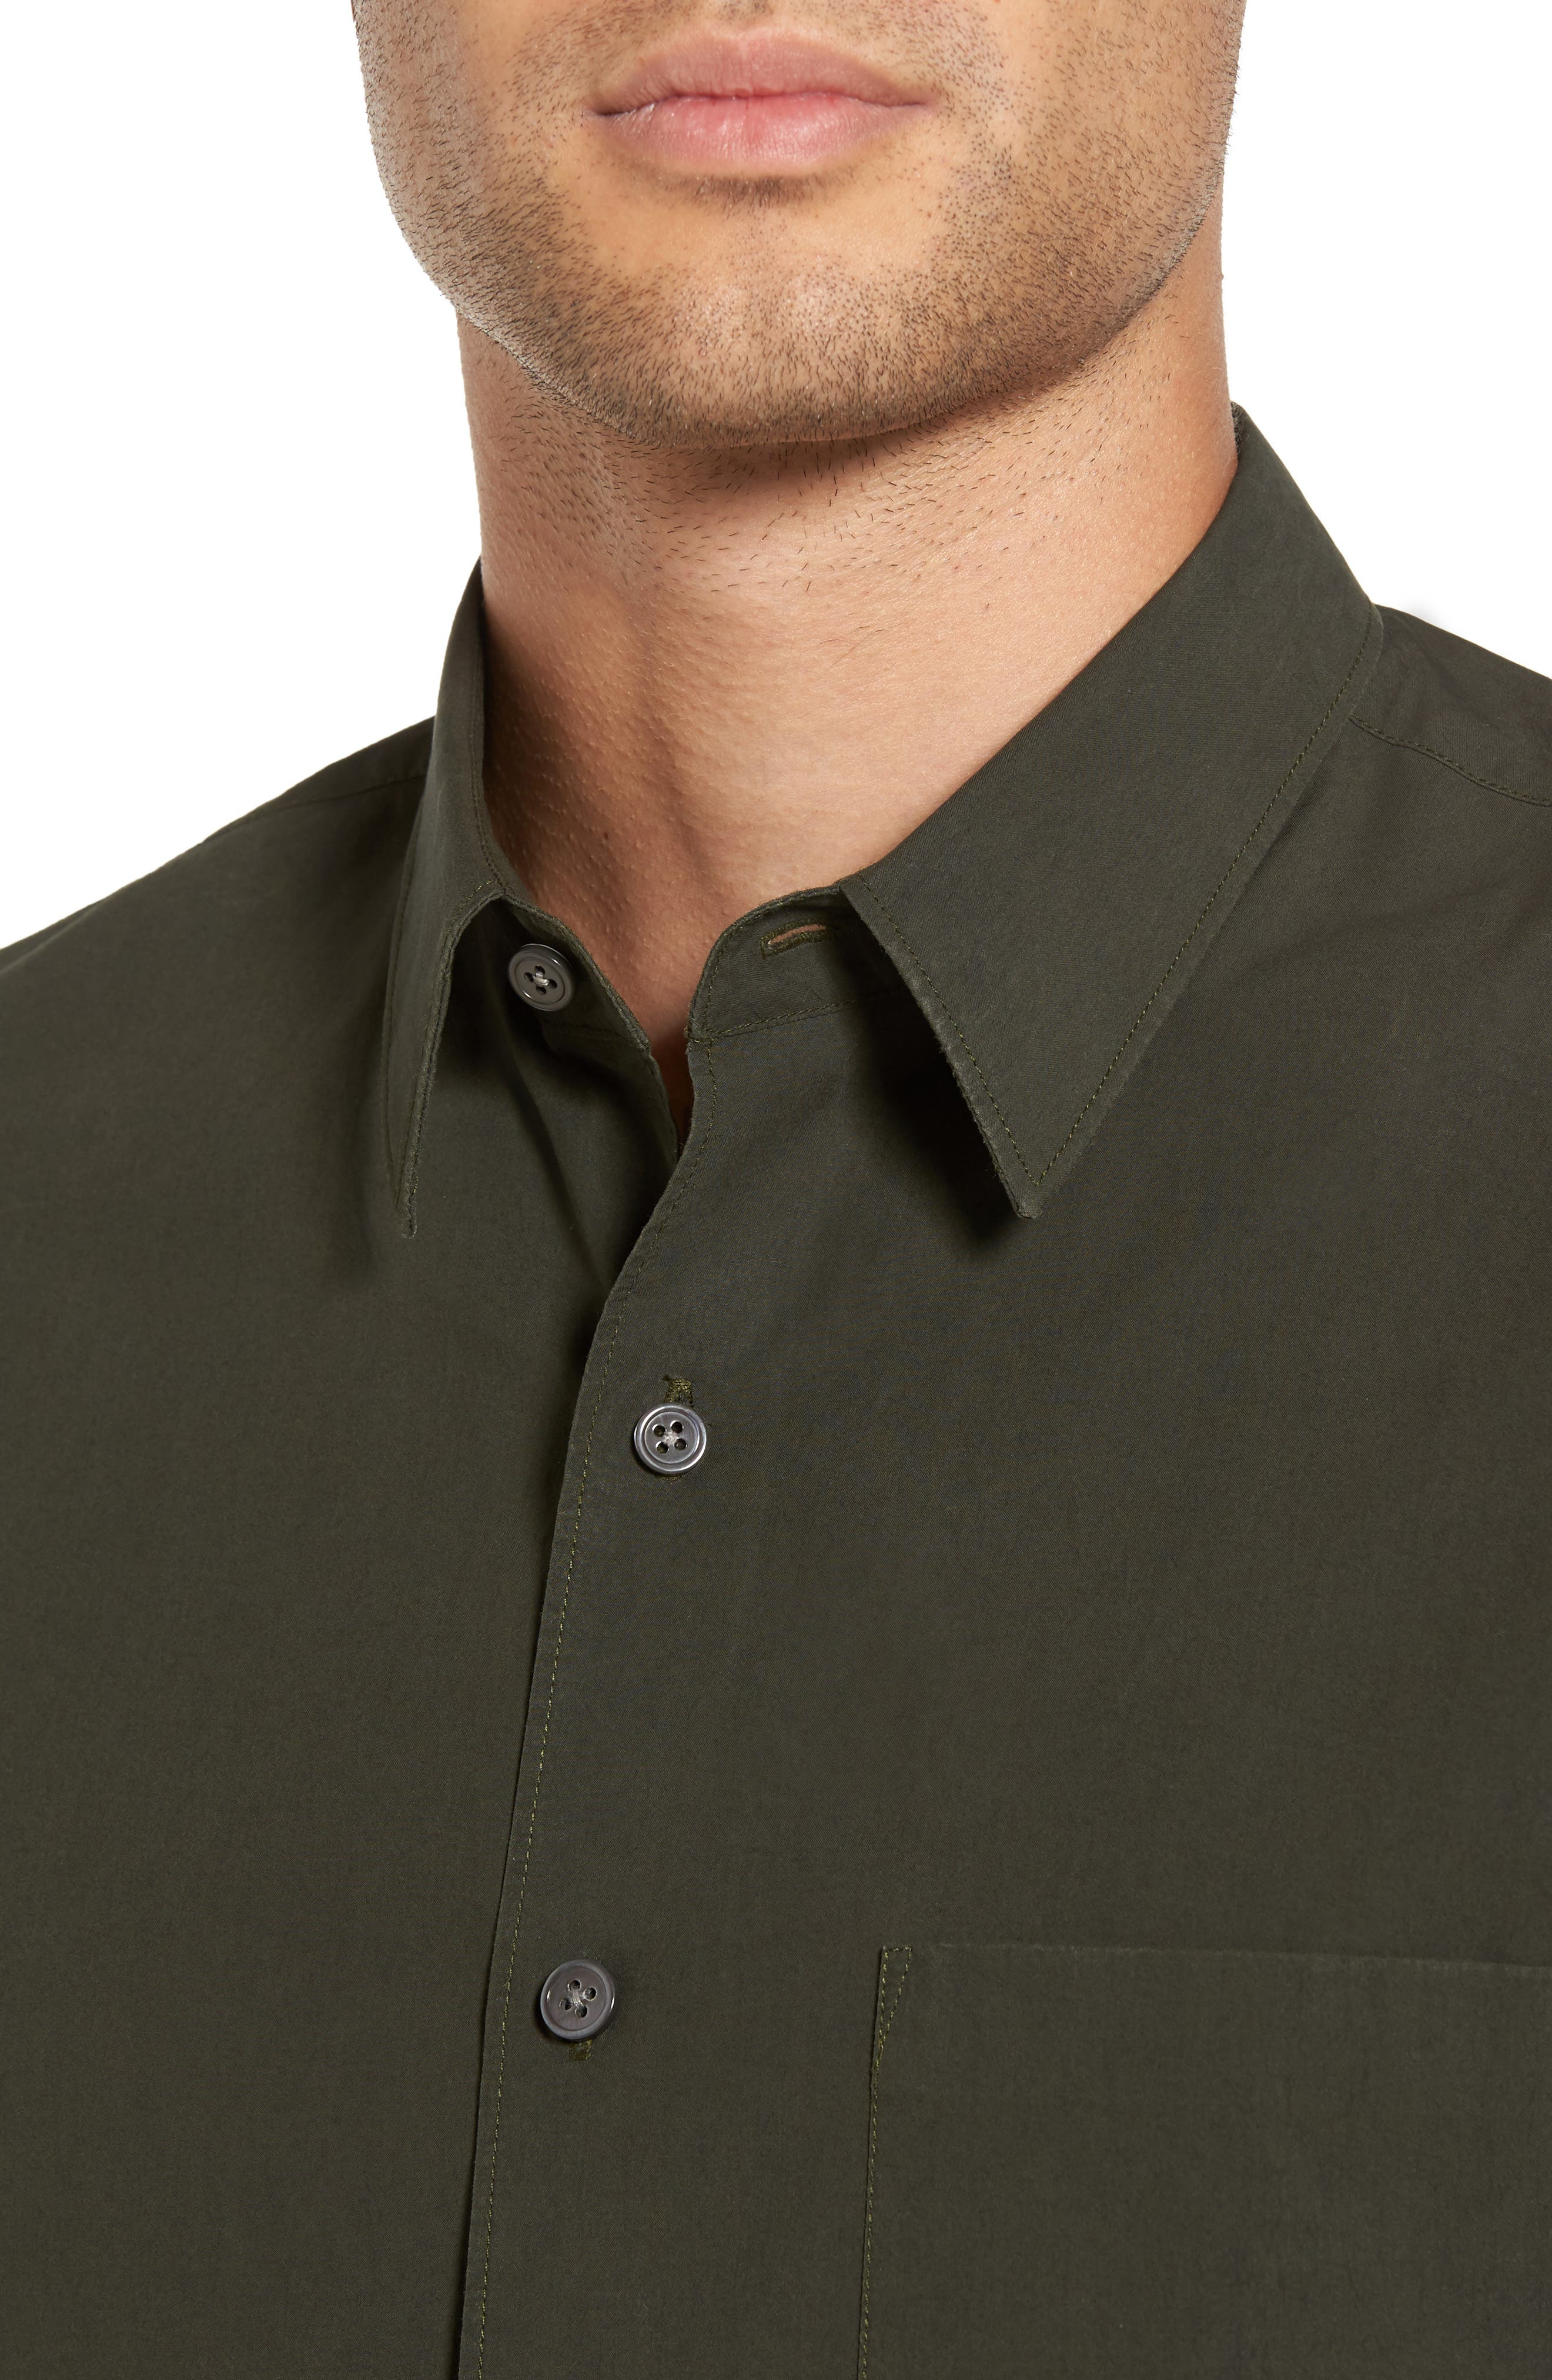 Rammy Trim Fit Solid Sport Shirt,                             Alternate thumbnail 4, color,                             Mantis